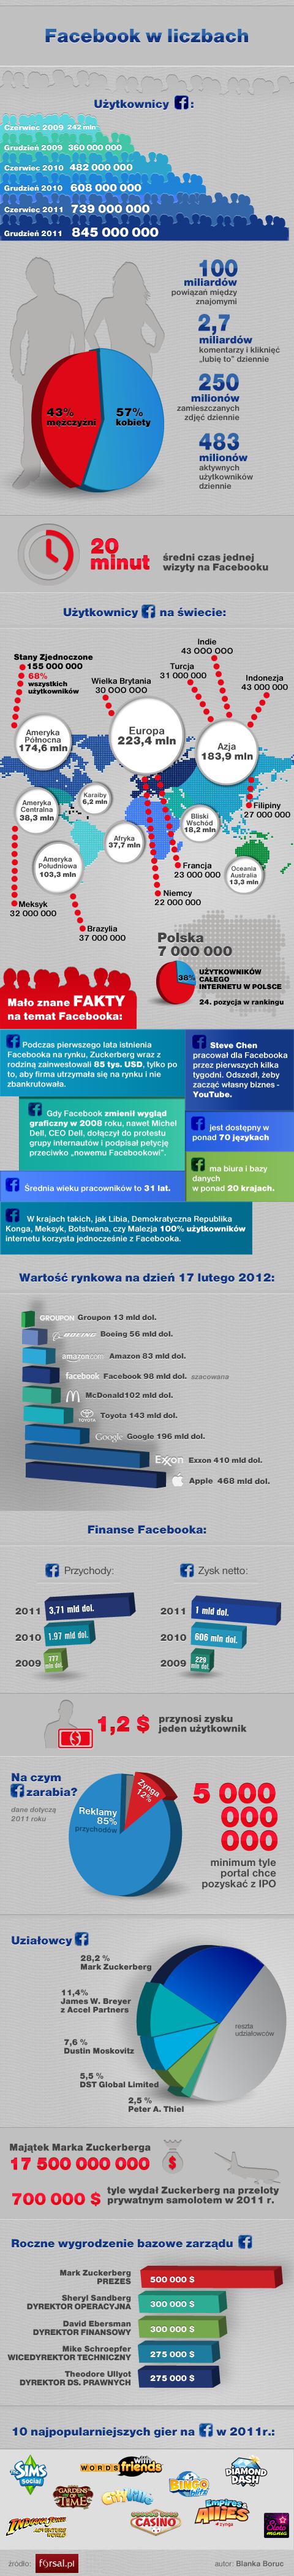 Facebook w liczbach